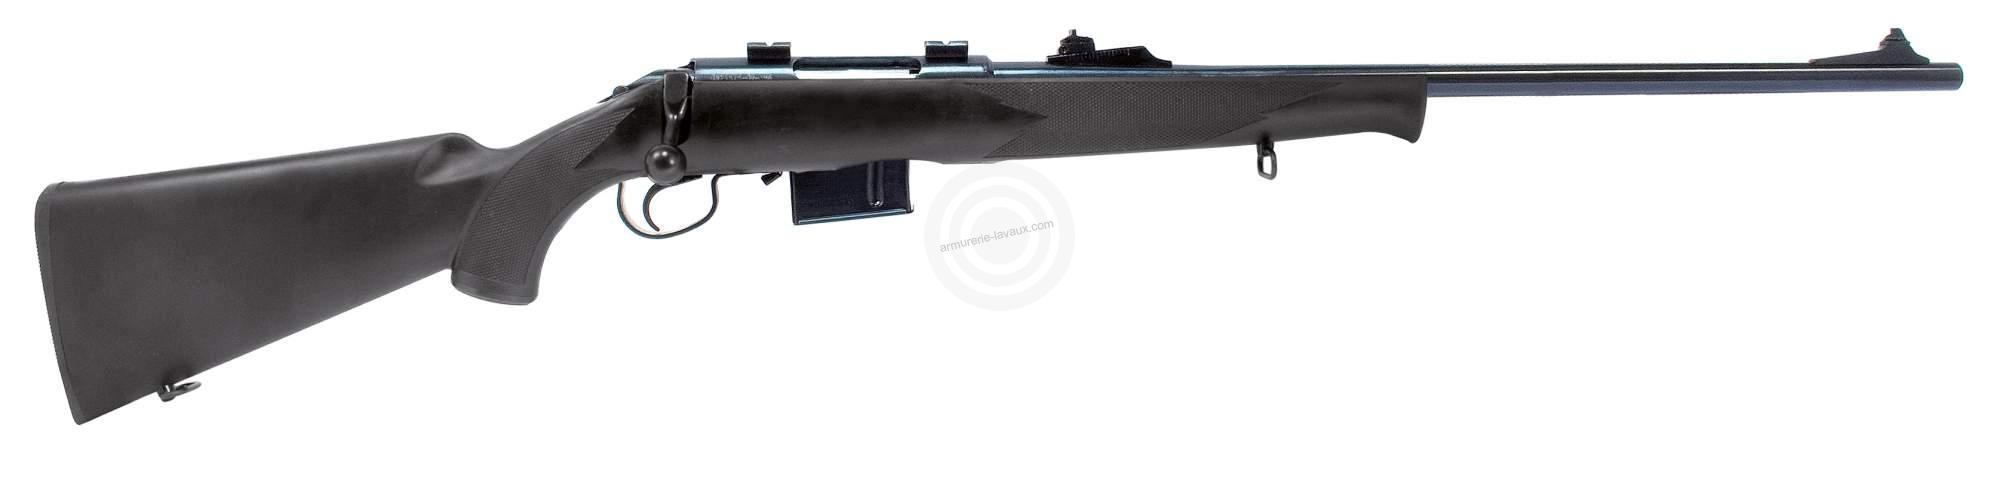 Carabine NORINCO JW105 Synthetique cal.222 Rem